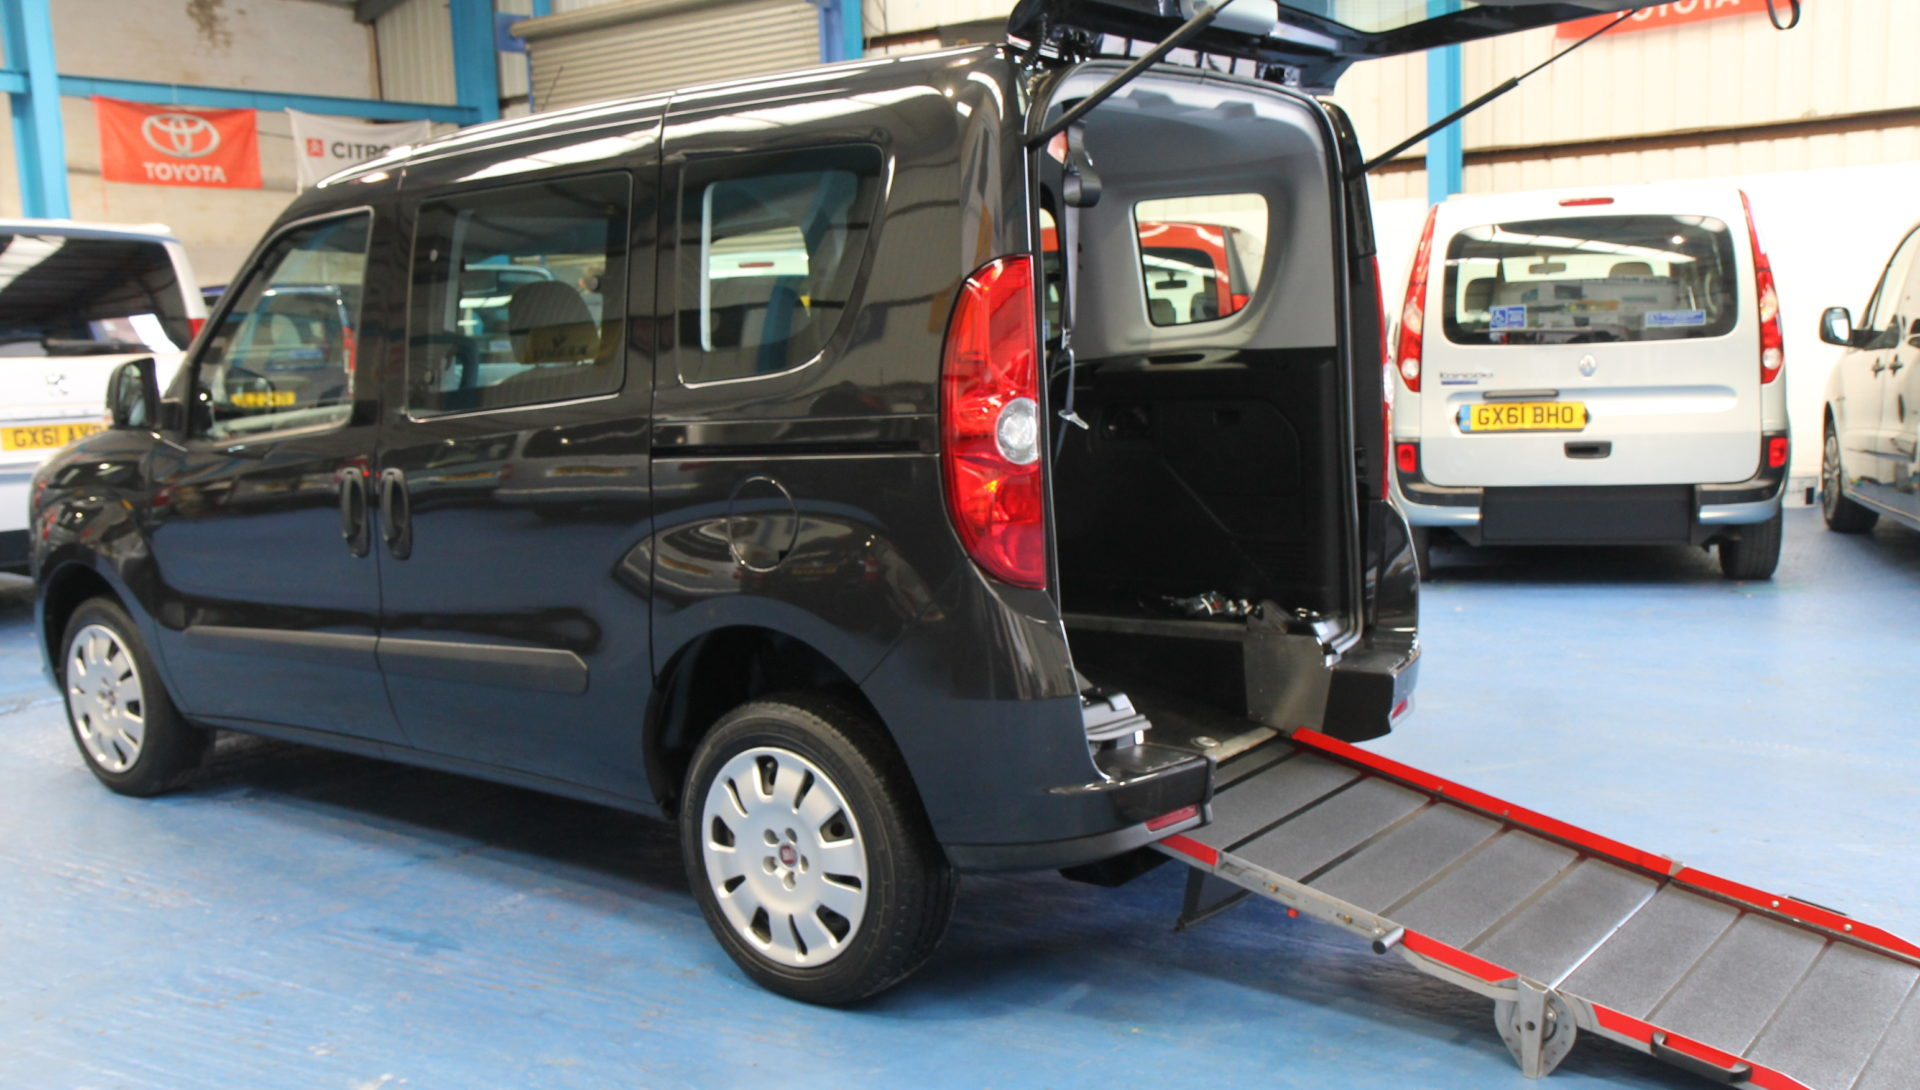 New Shape doblo Wheelchair accessible vehicle yx12ewm